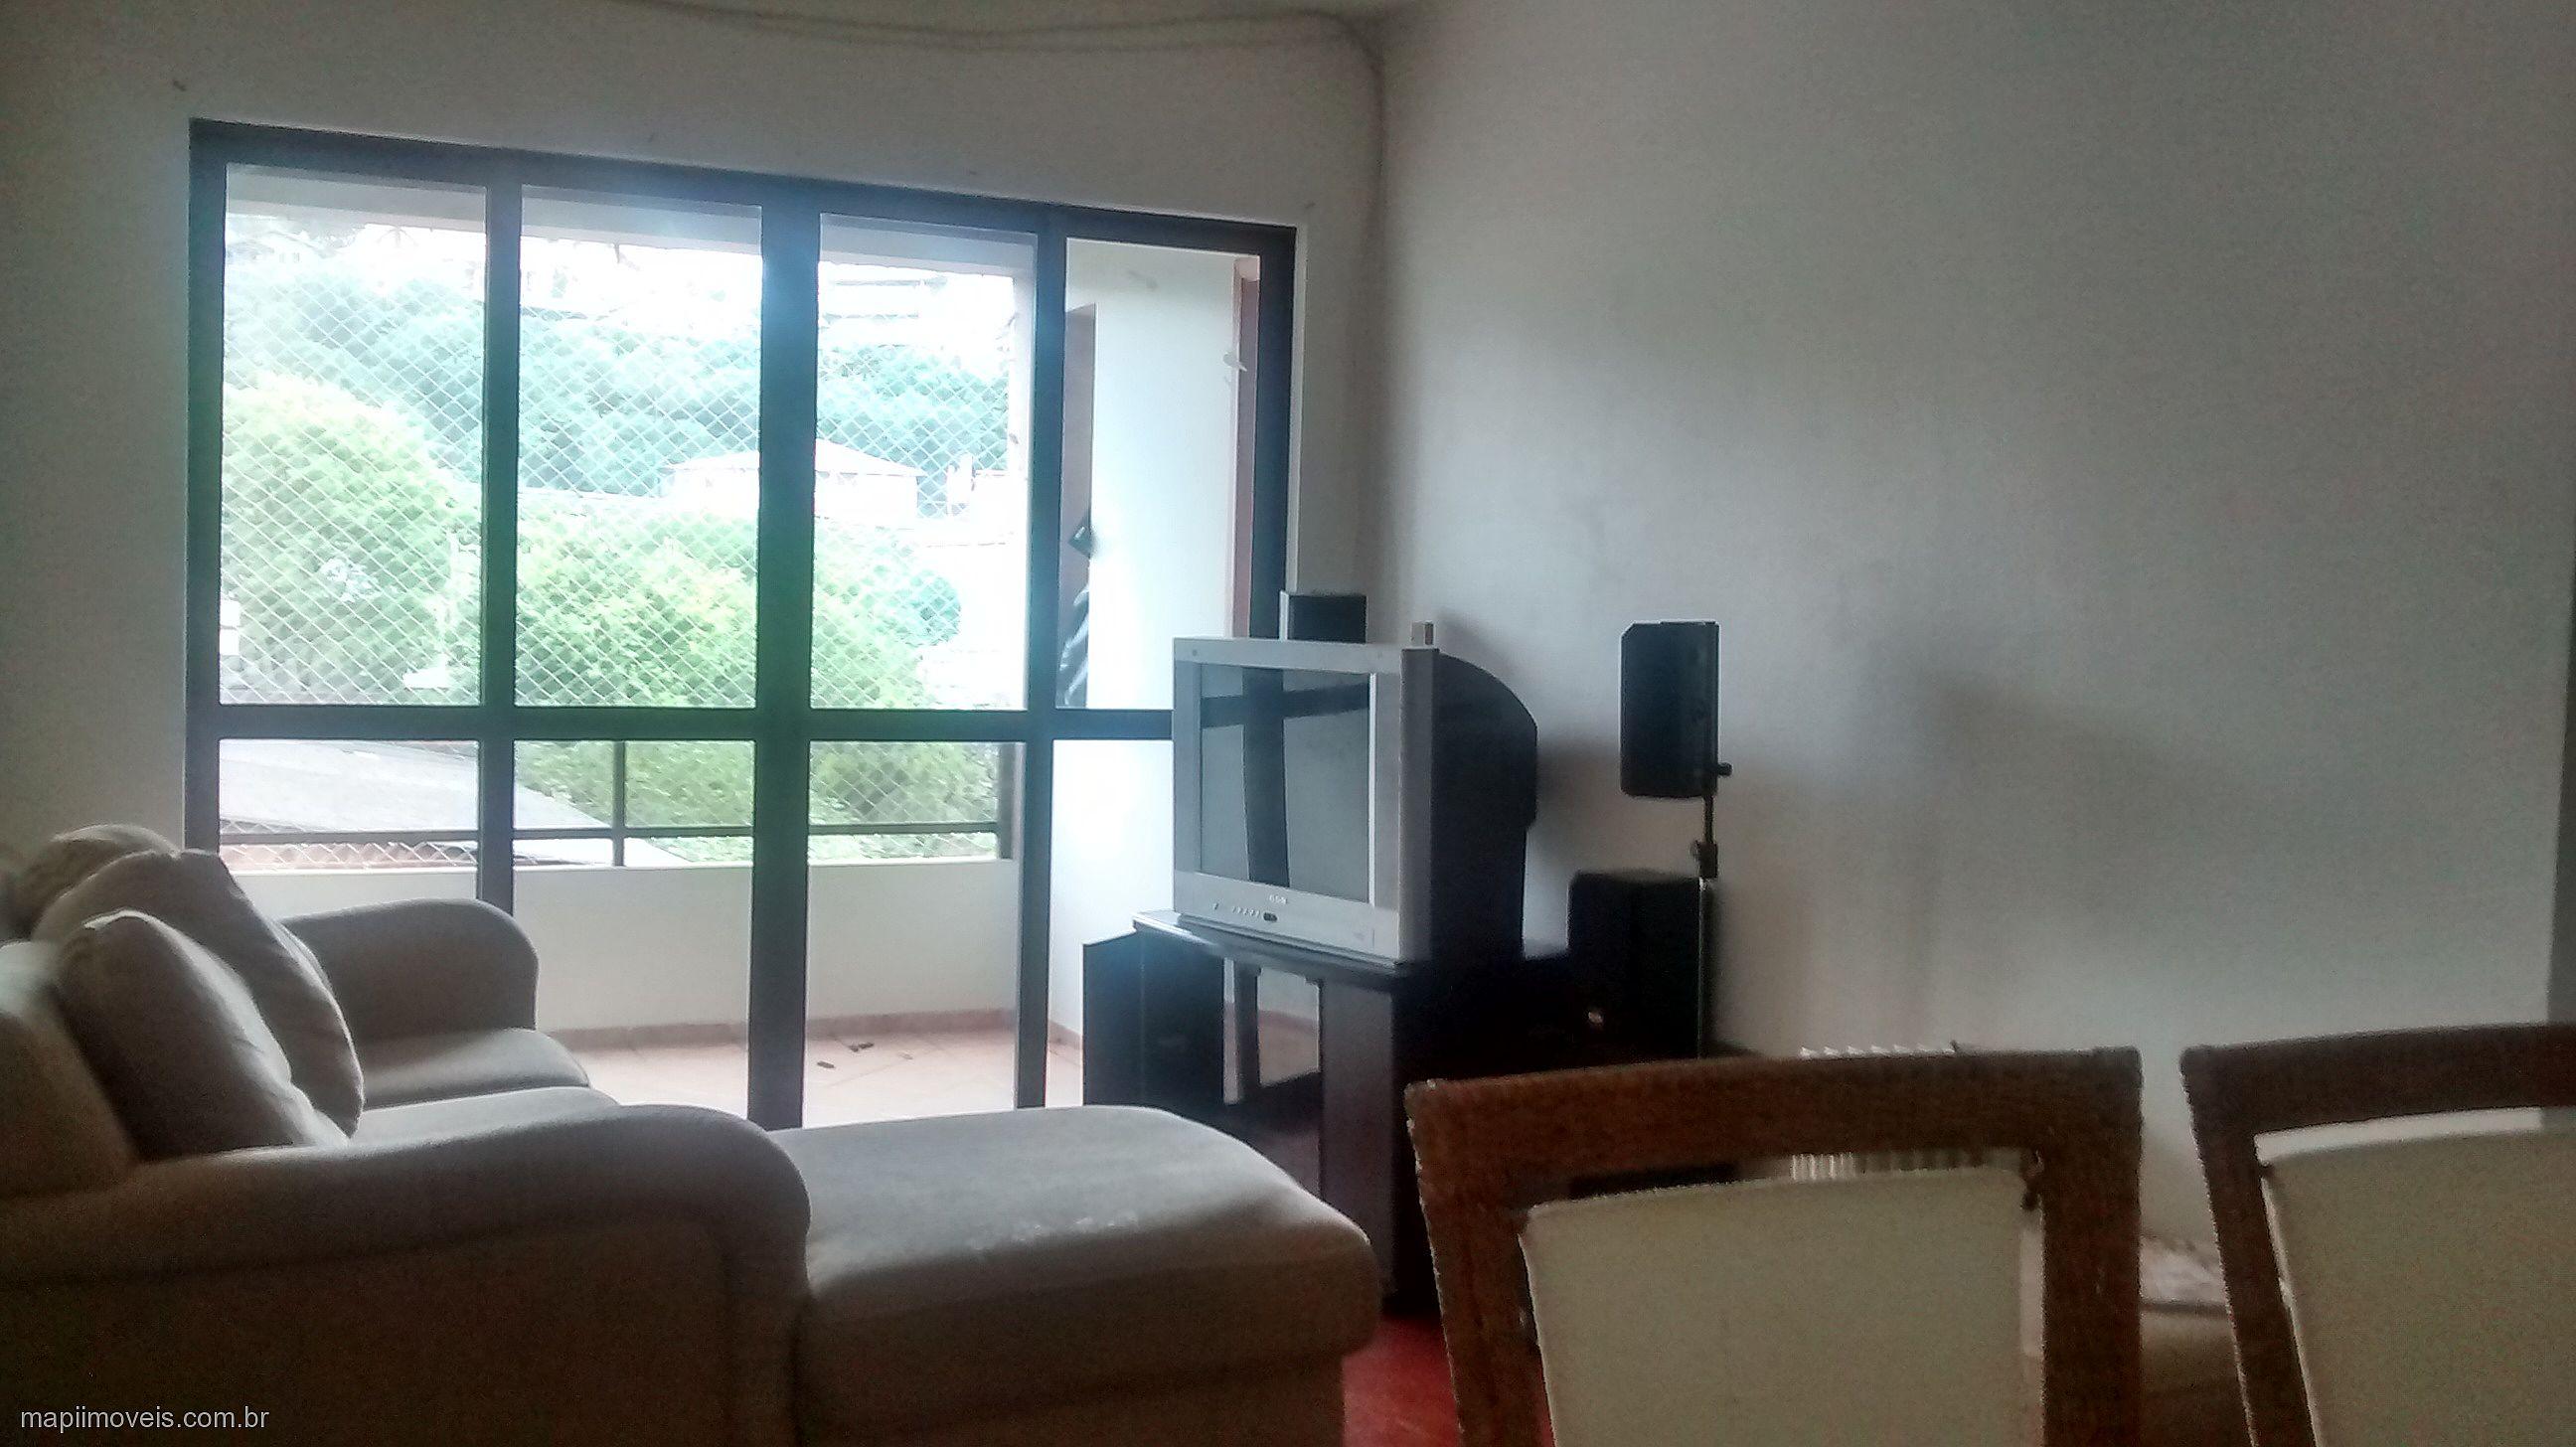 Mapi Imóveis - Apto 2 Dorm, Rio Branco (285477)